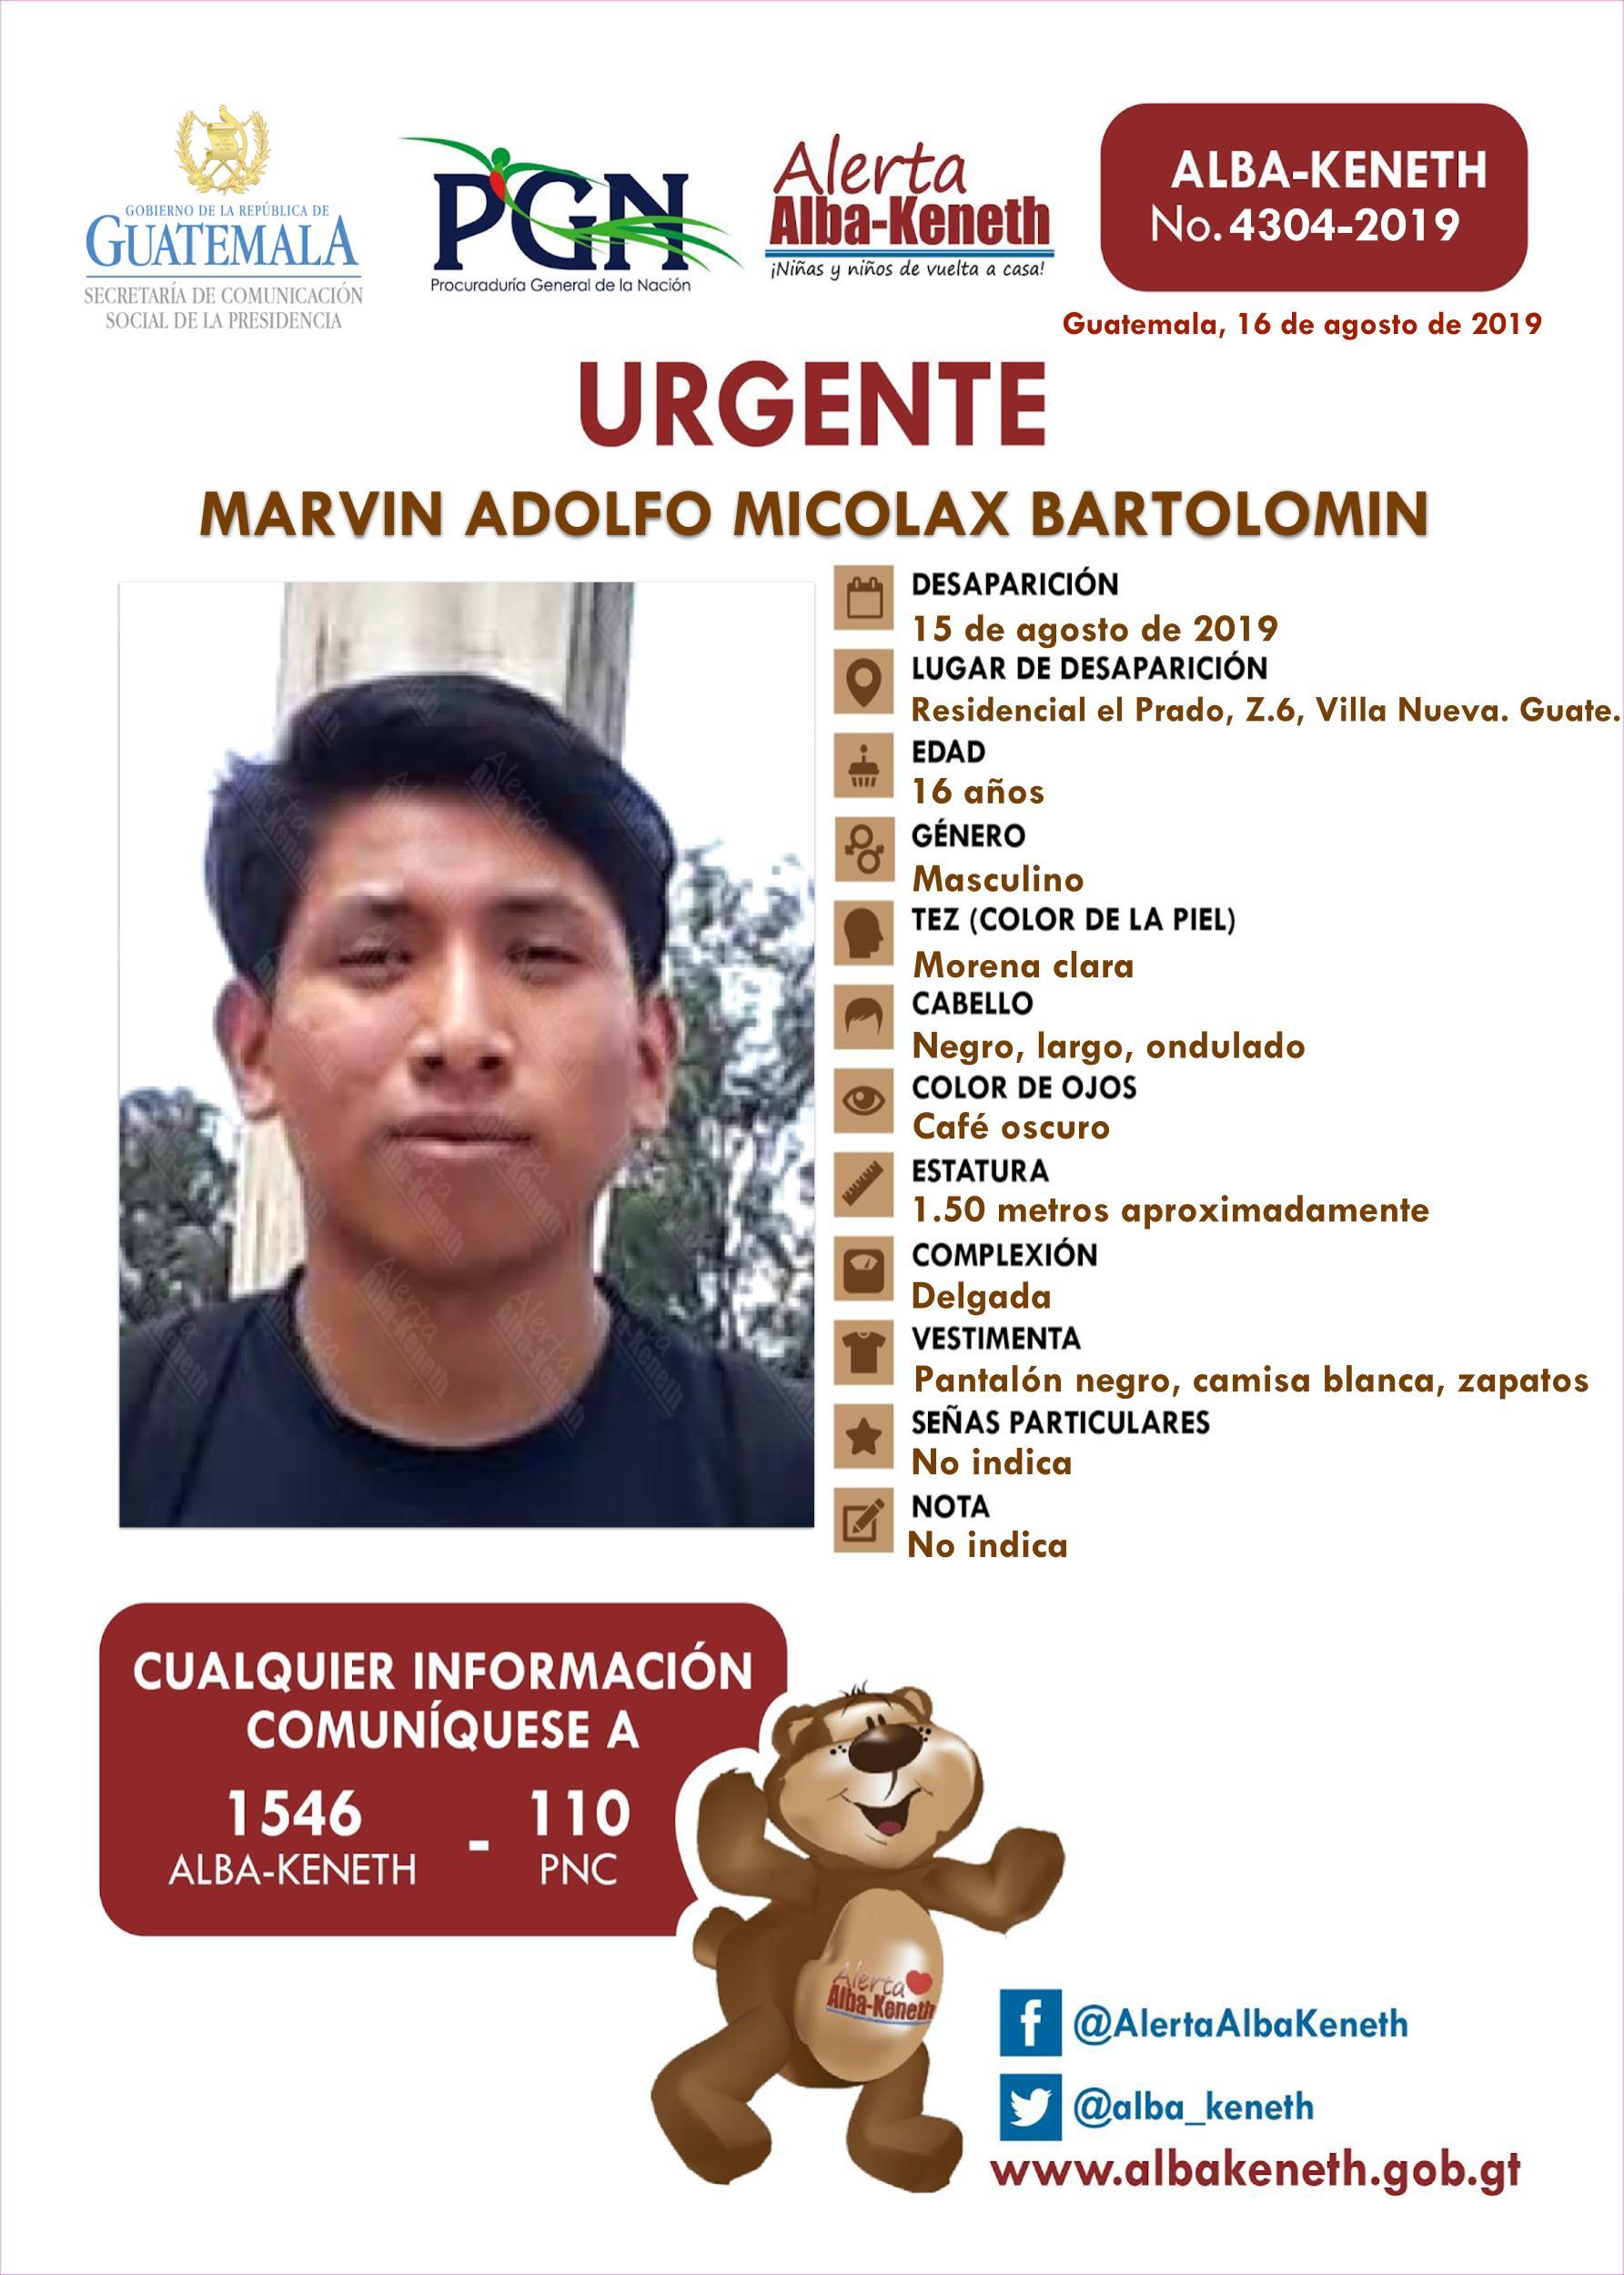 Marvin Adolfo Micolax Bartolomin